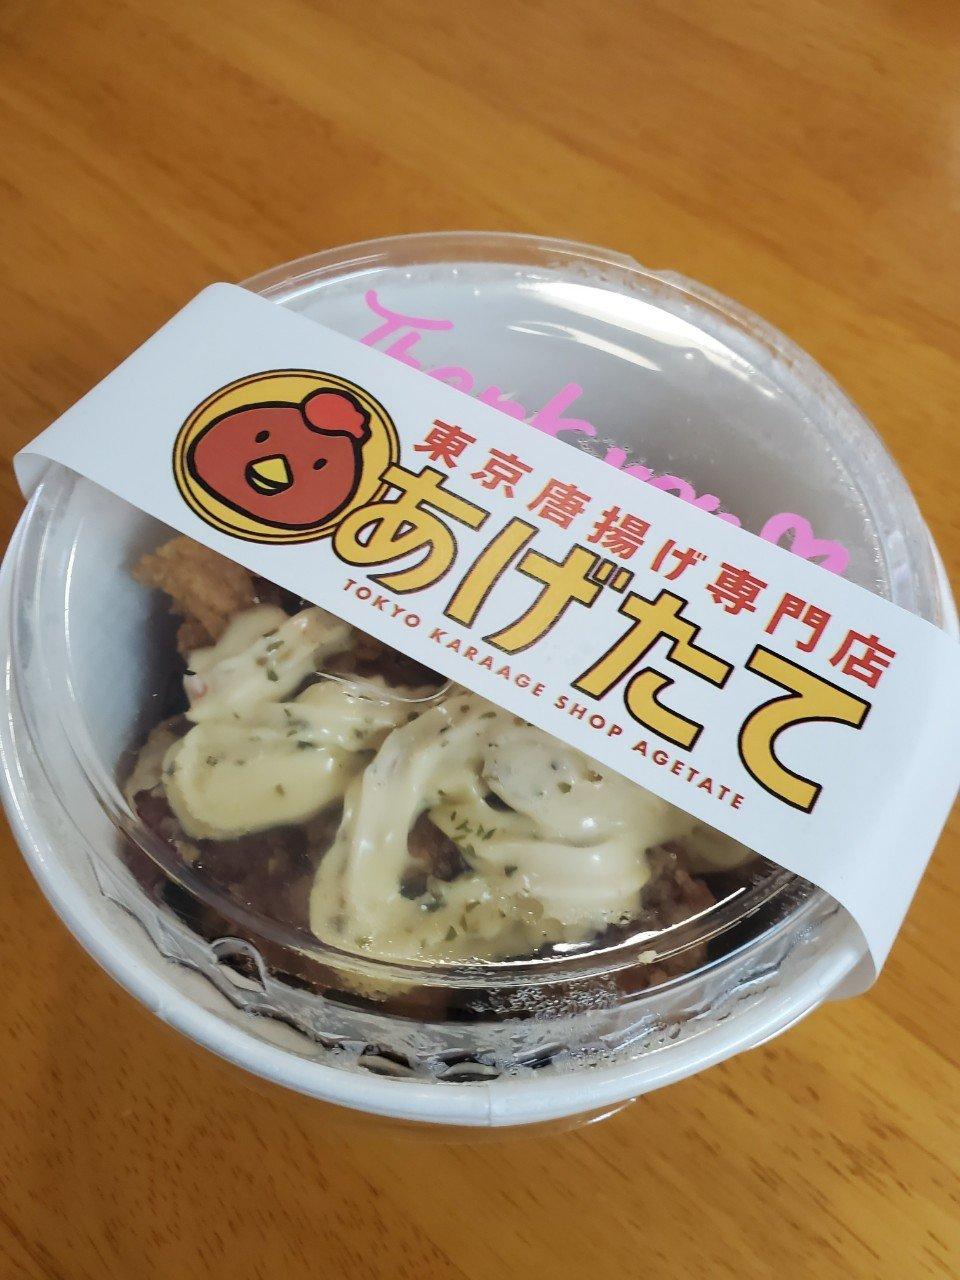 https://www.furusatoen.jp/blog/official/2020/05/2020515_200515_0033.jpg